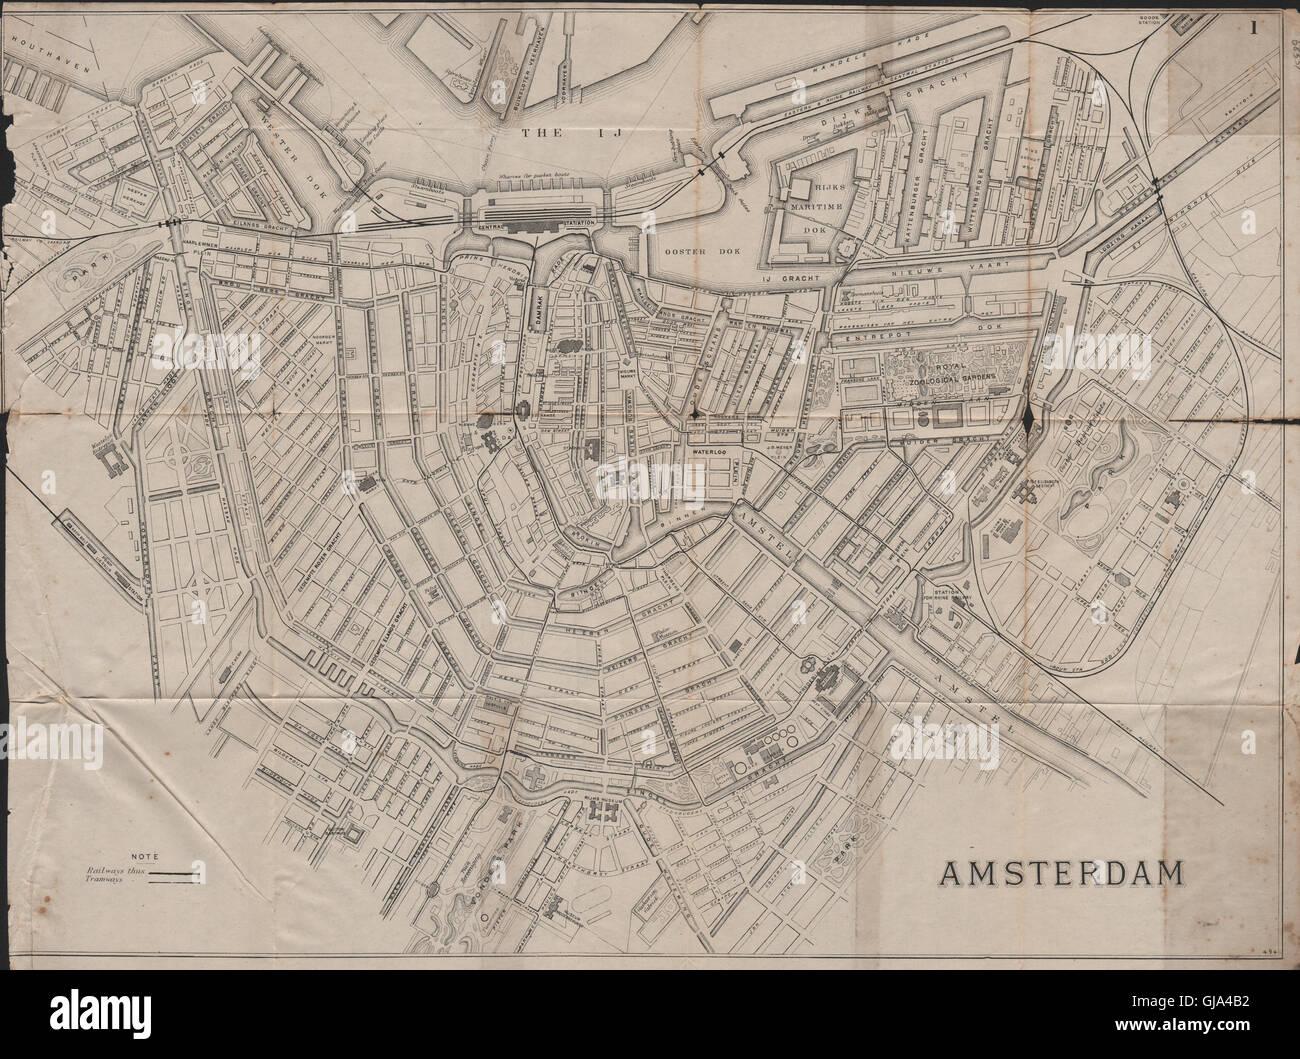 AMSTERDAM. Antique town plan. City map. Netherlands. BRADSHAW, 1895 ...